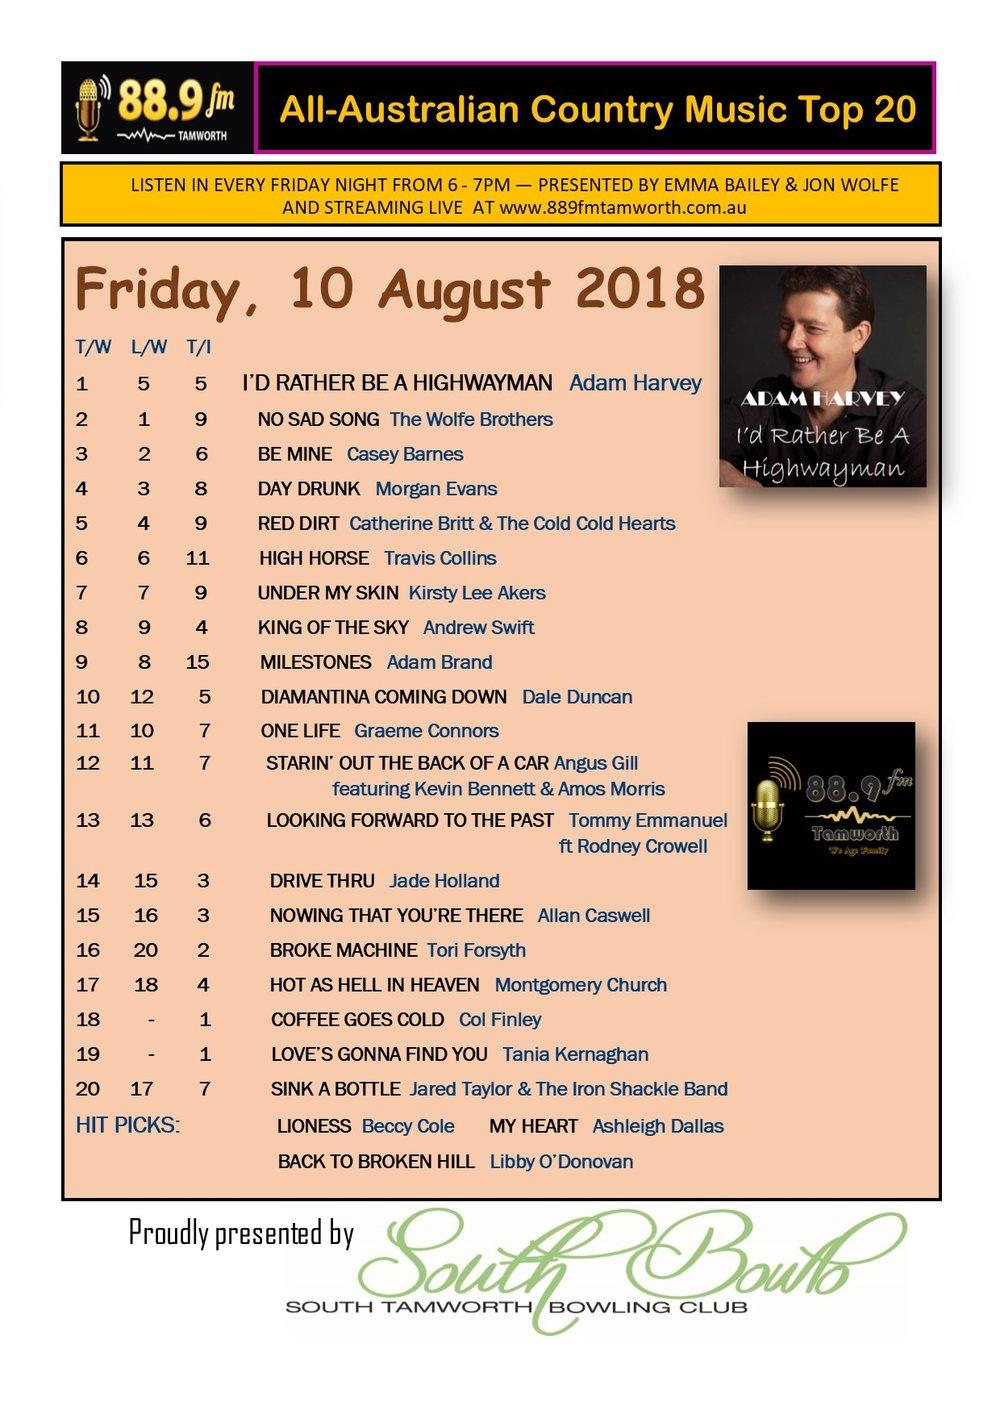 889FM CHART 10 August 2018.jpg